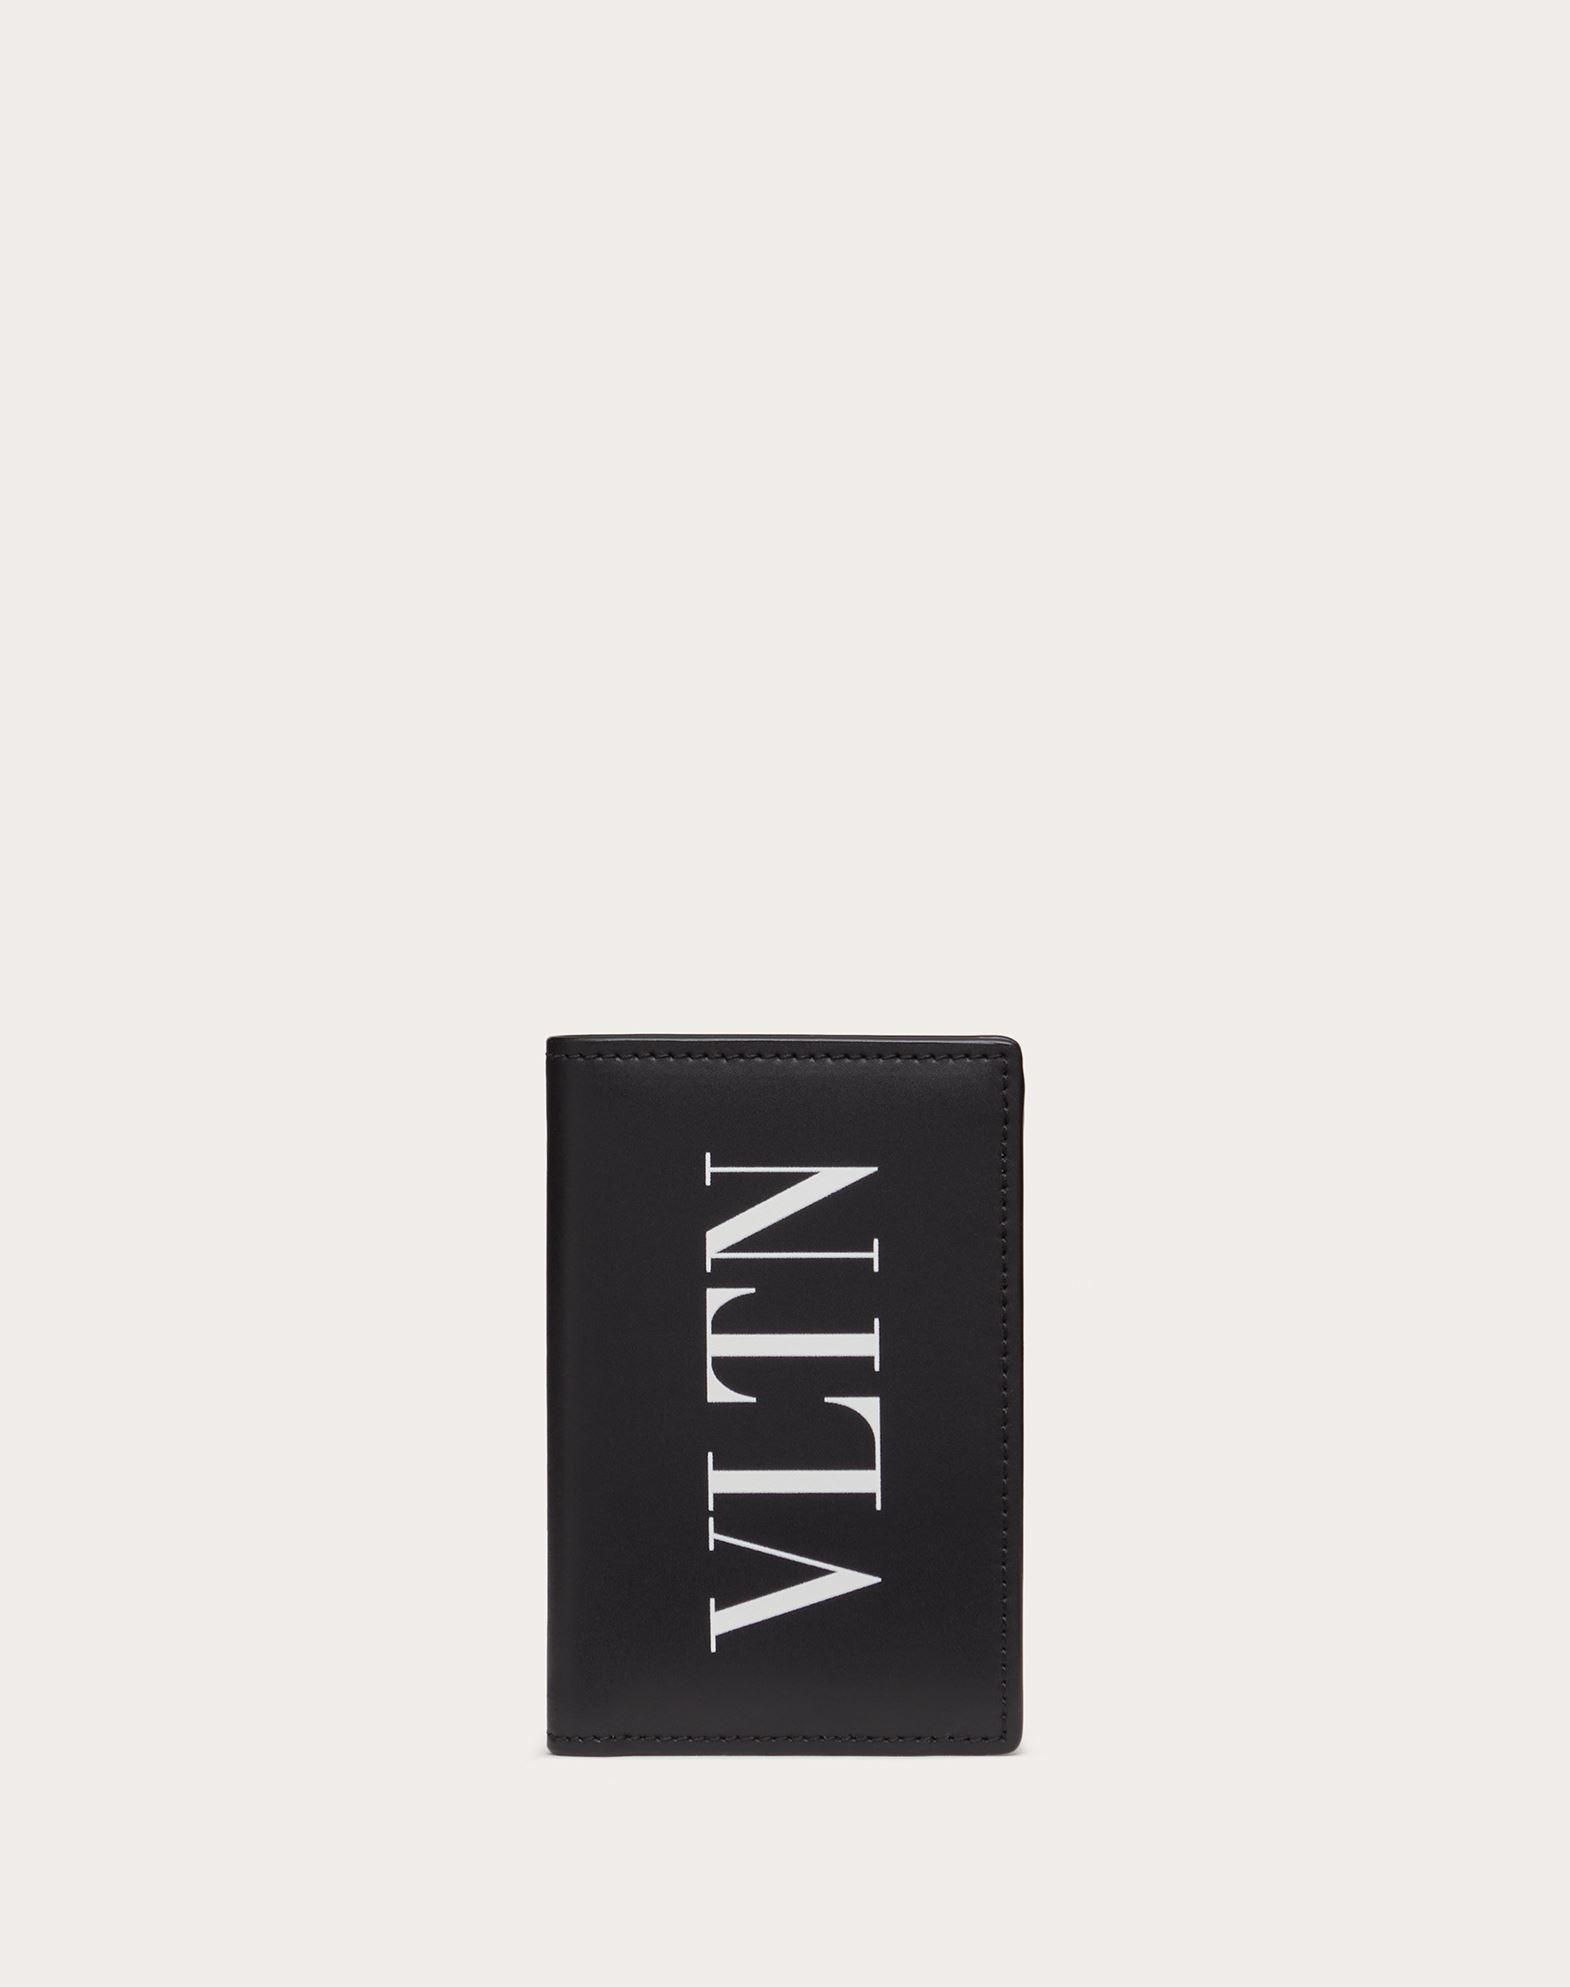 VALENTINO Internal card slots  46584285rq